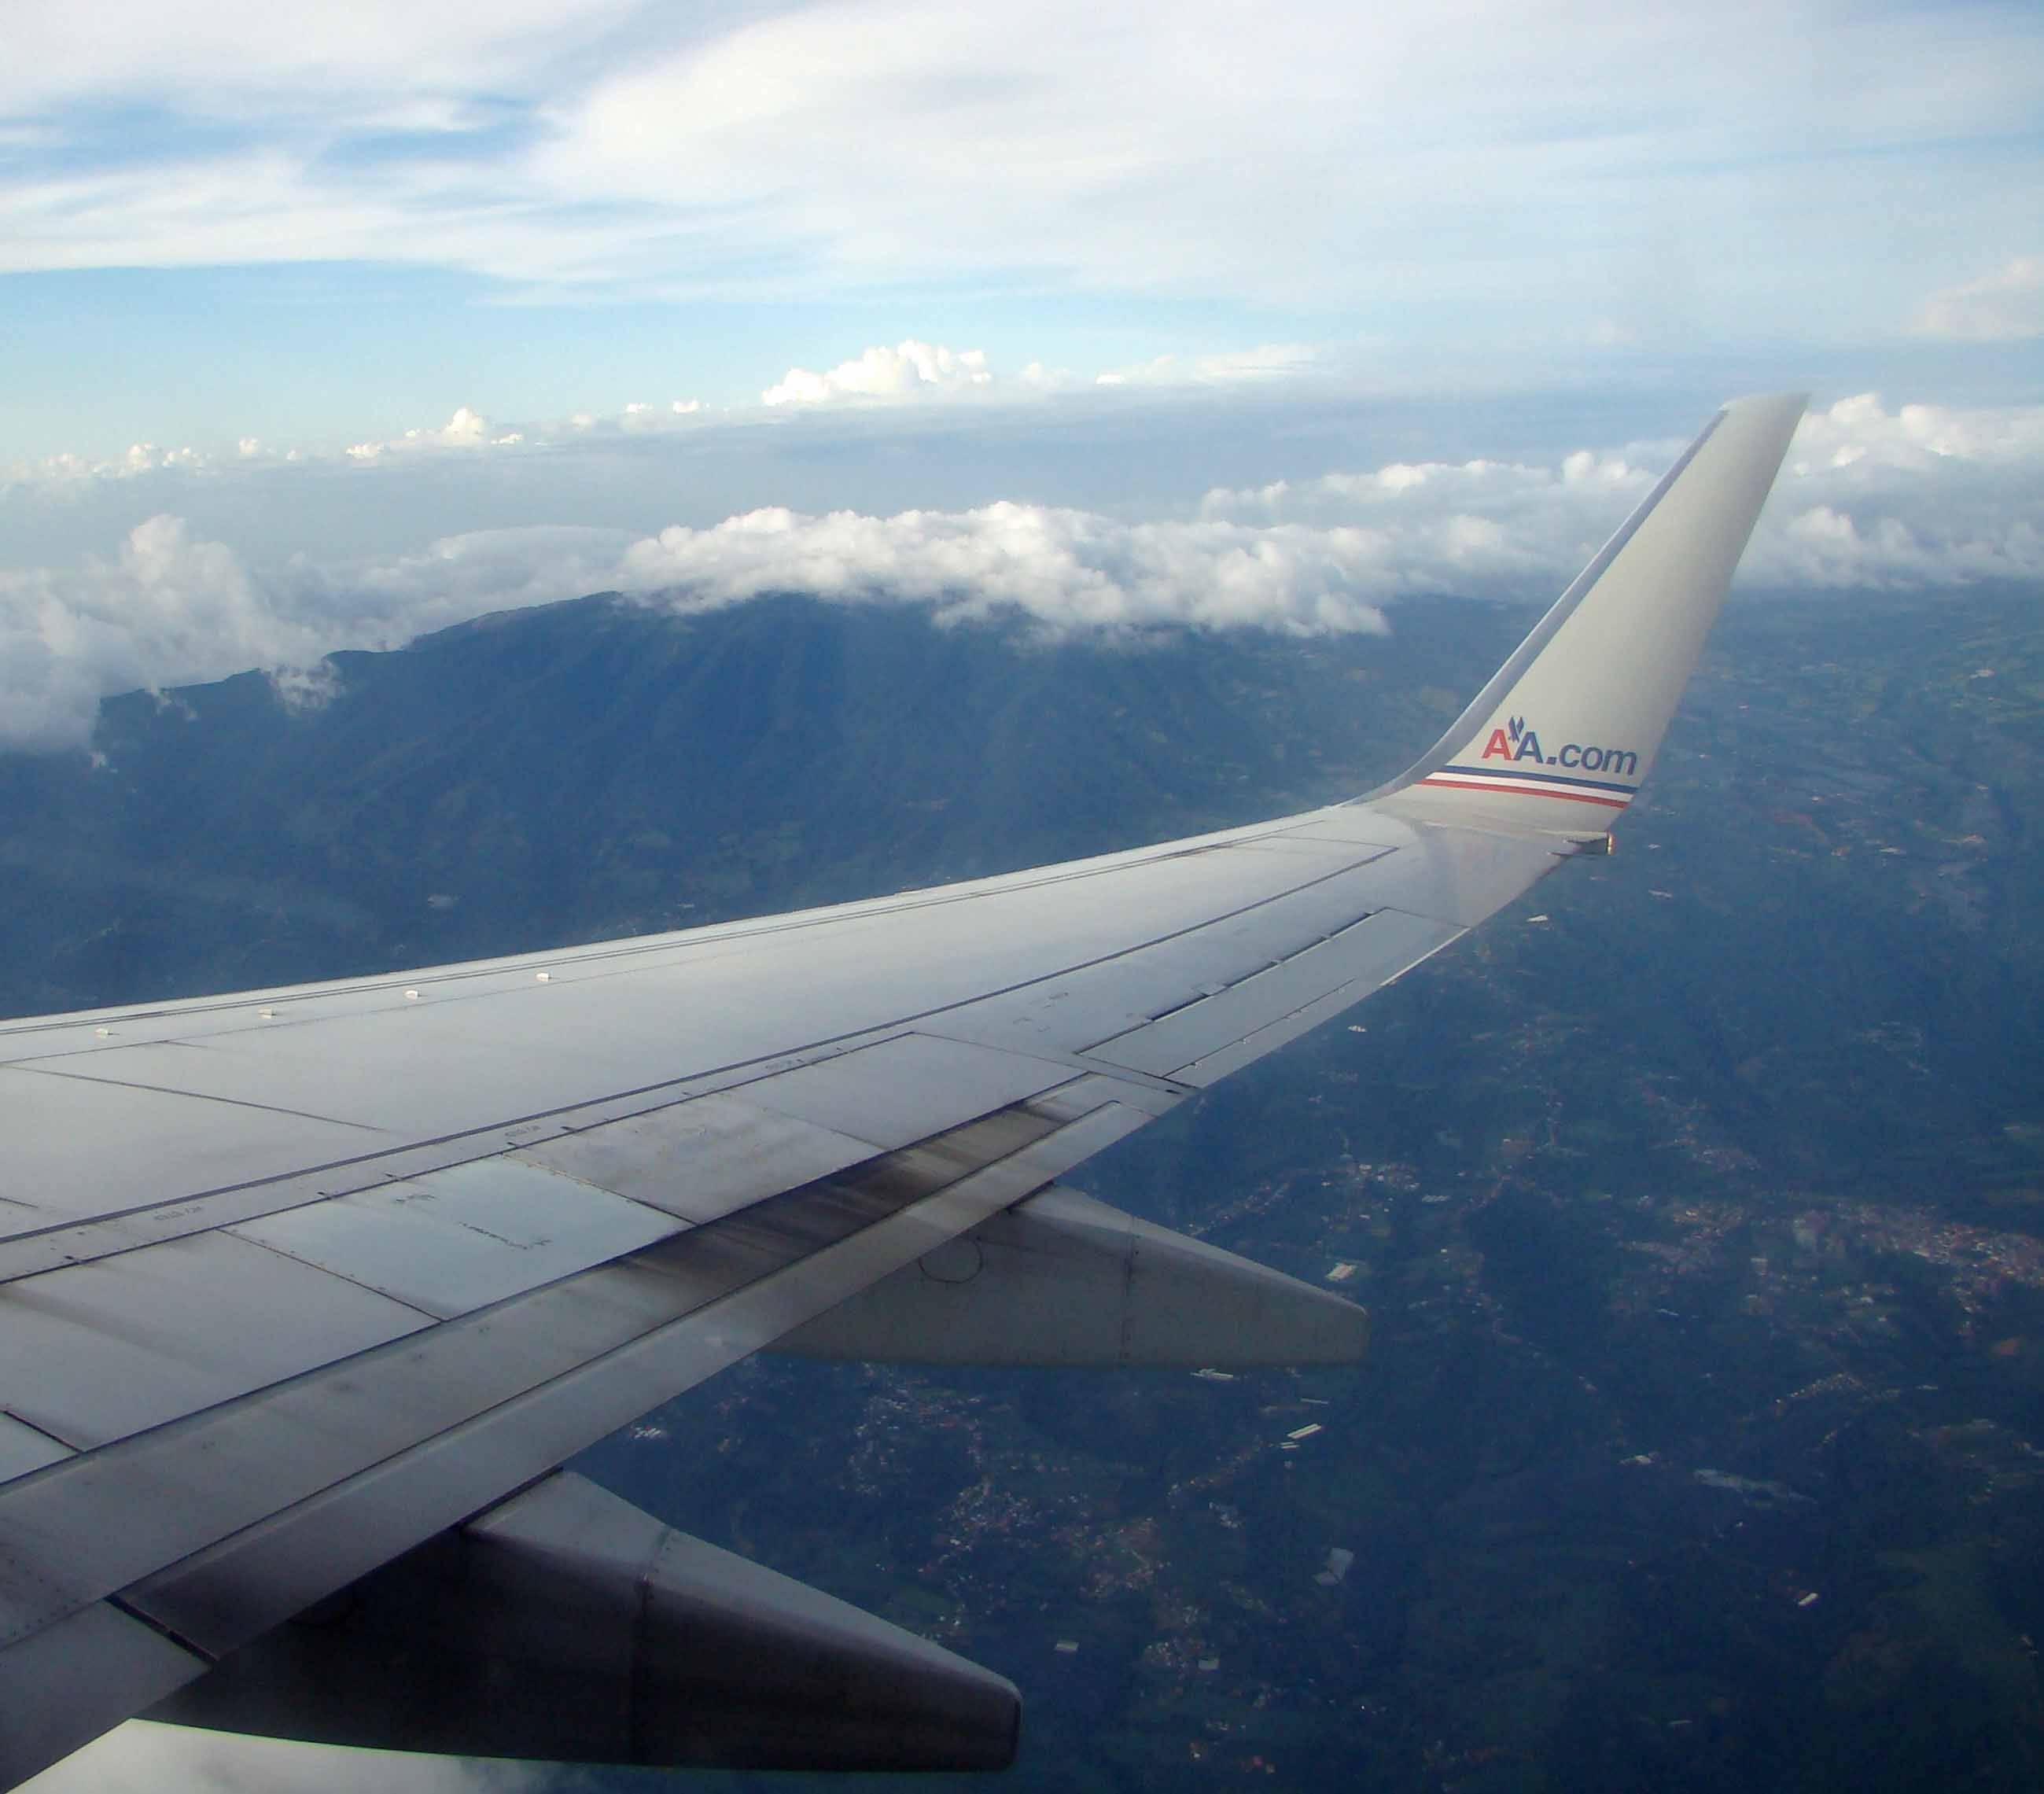 Rica costa today from atlanta to flights